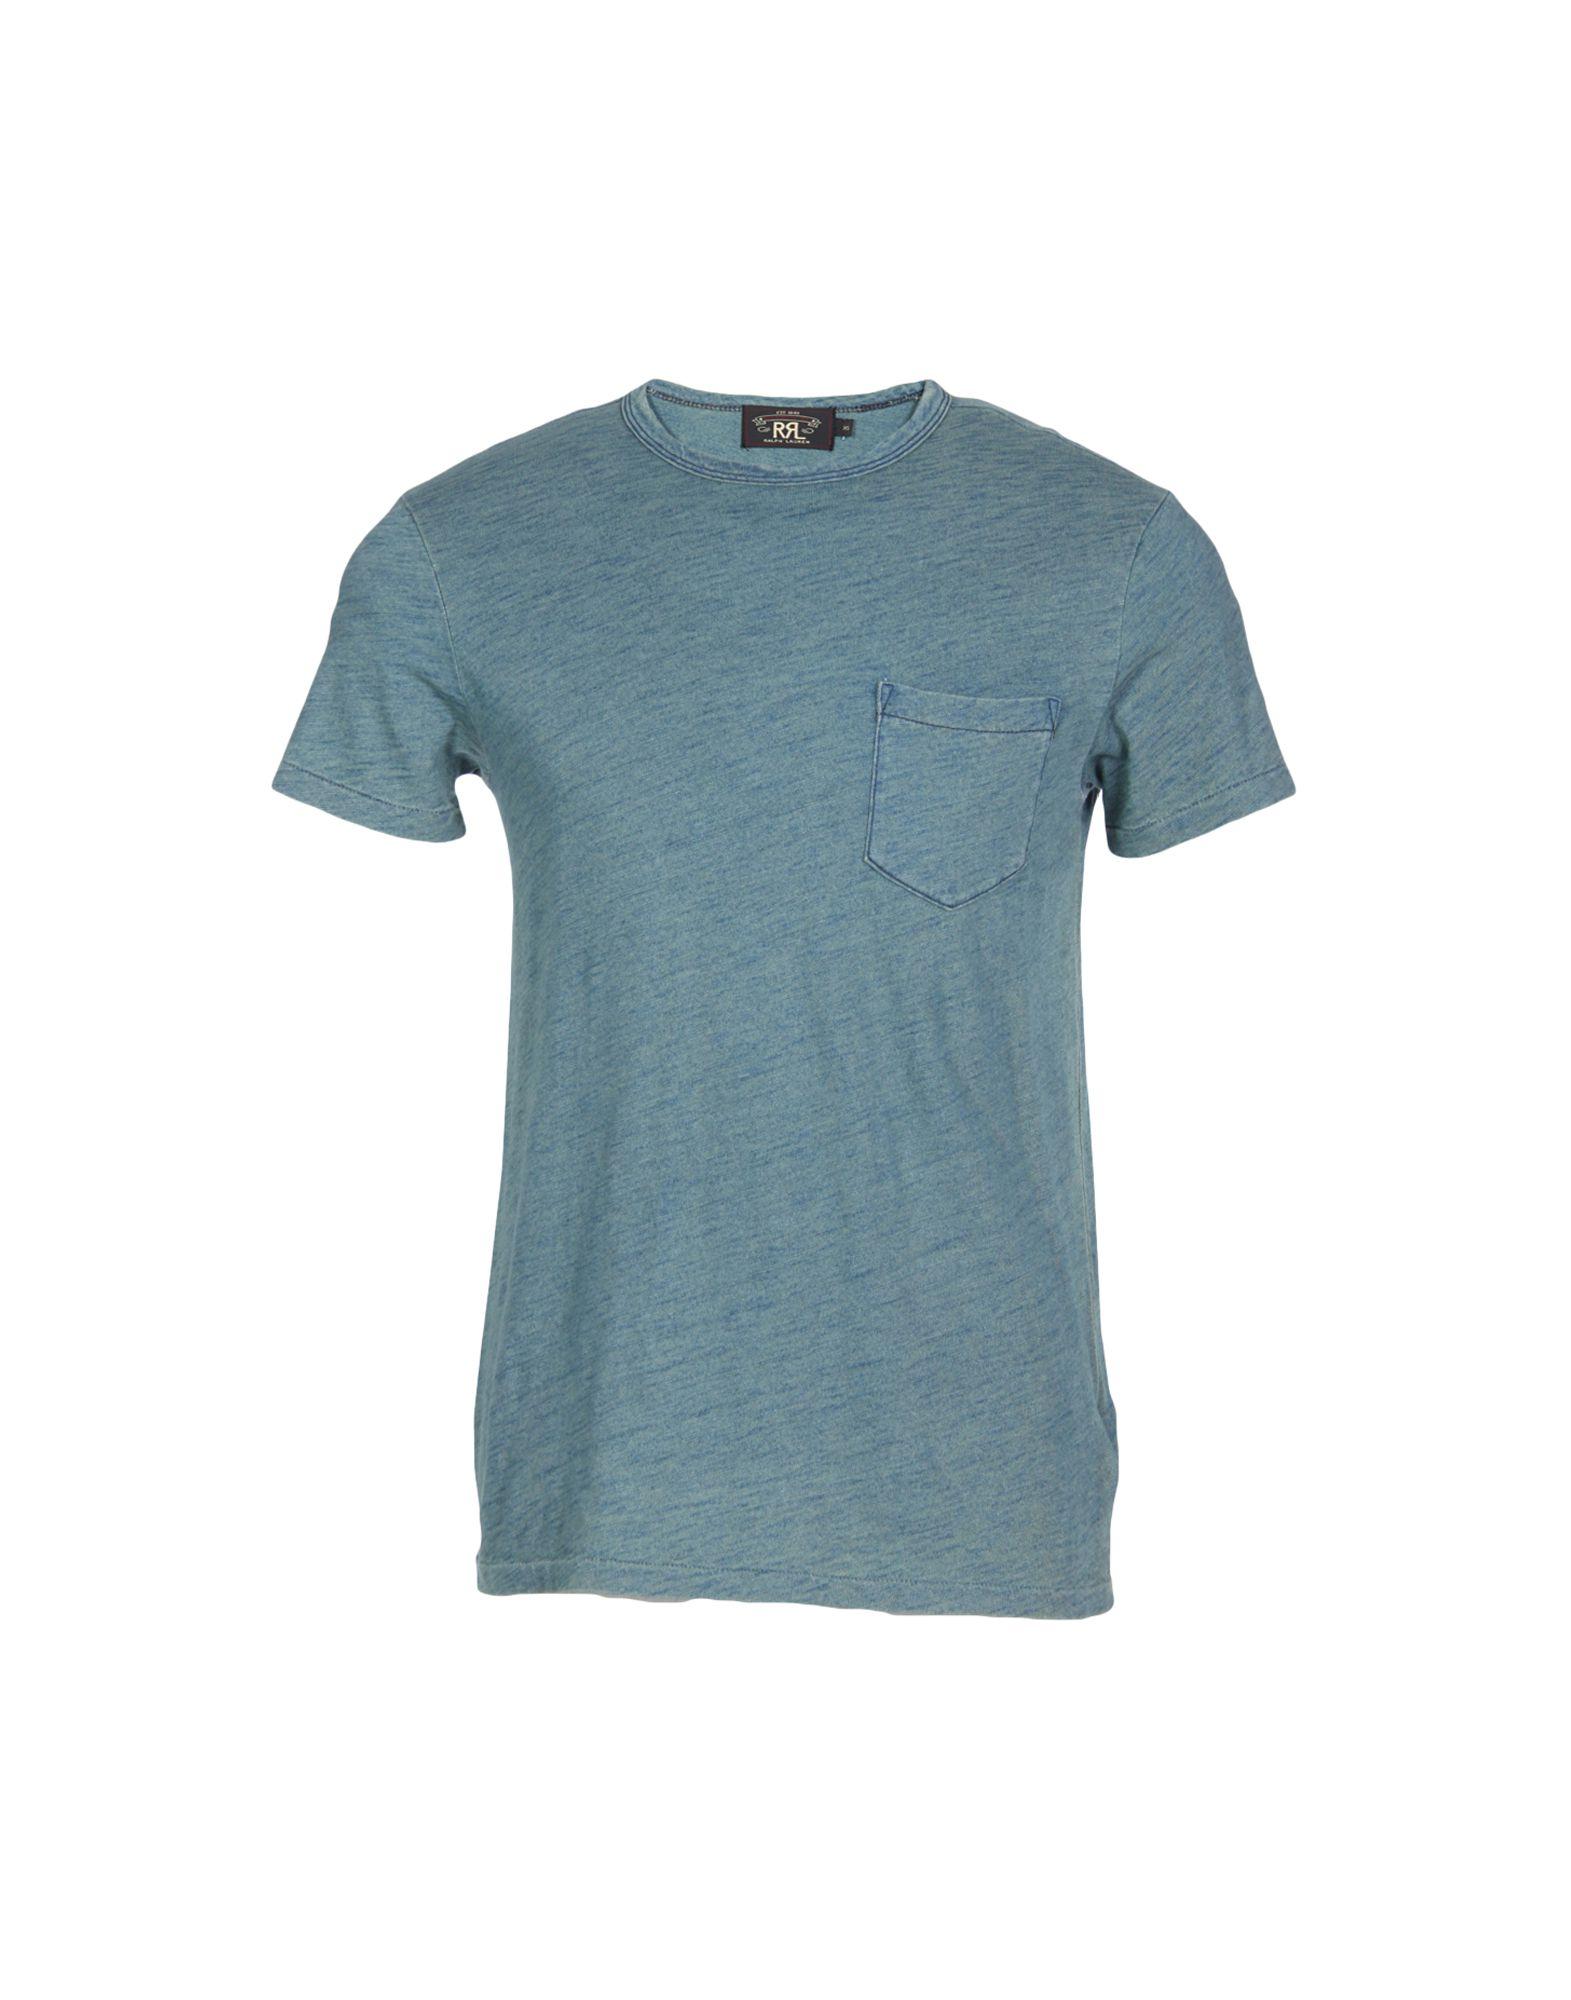 DOUBLE RL & CO. T-shirts